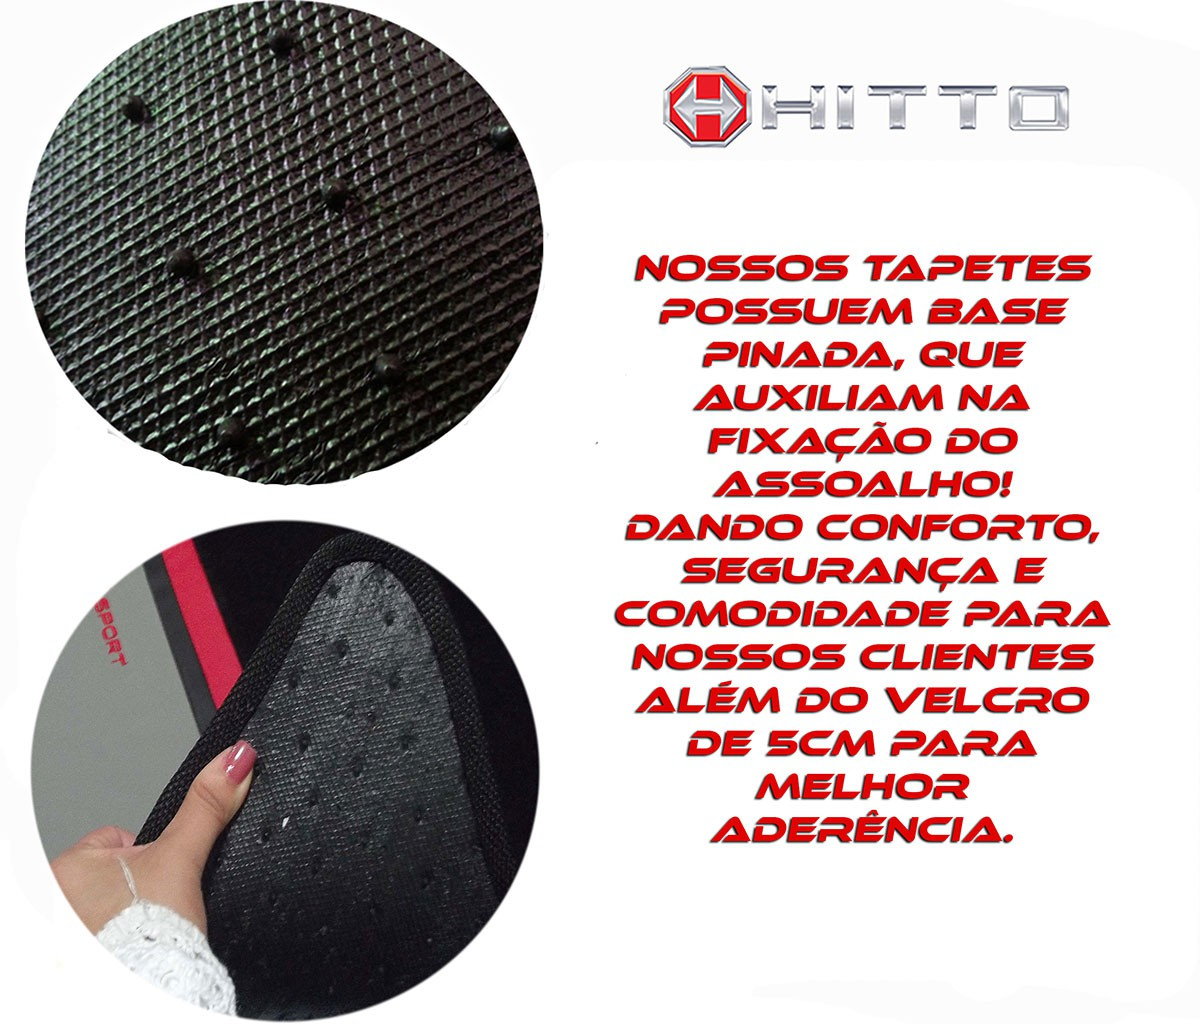 Porta Malas Astra Gsi 16v Carpete Luxo Base Pinada Hitto